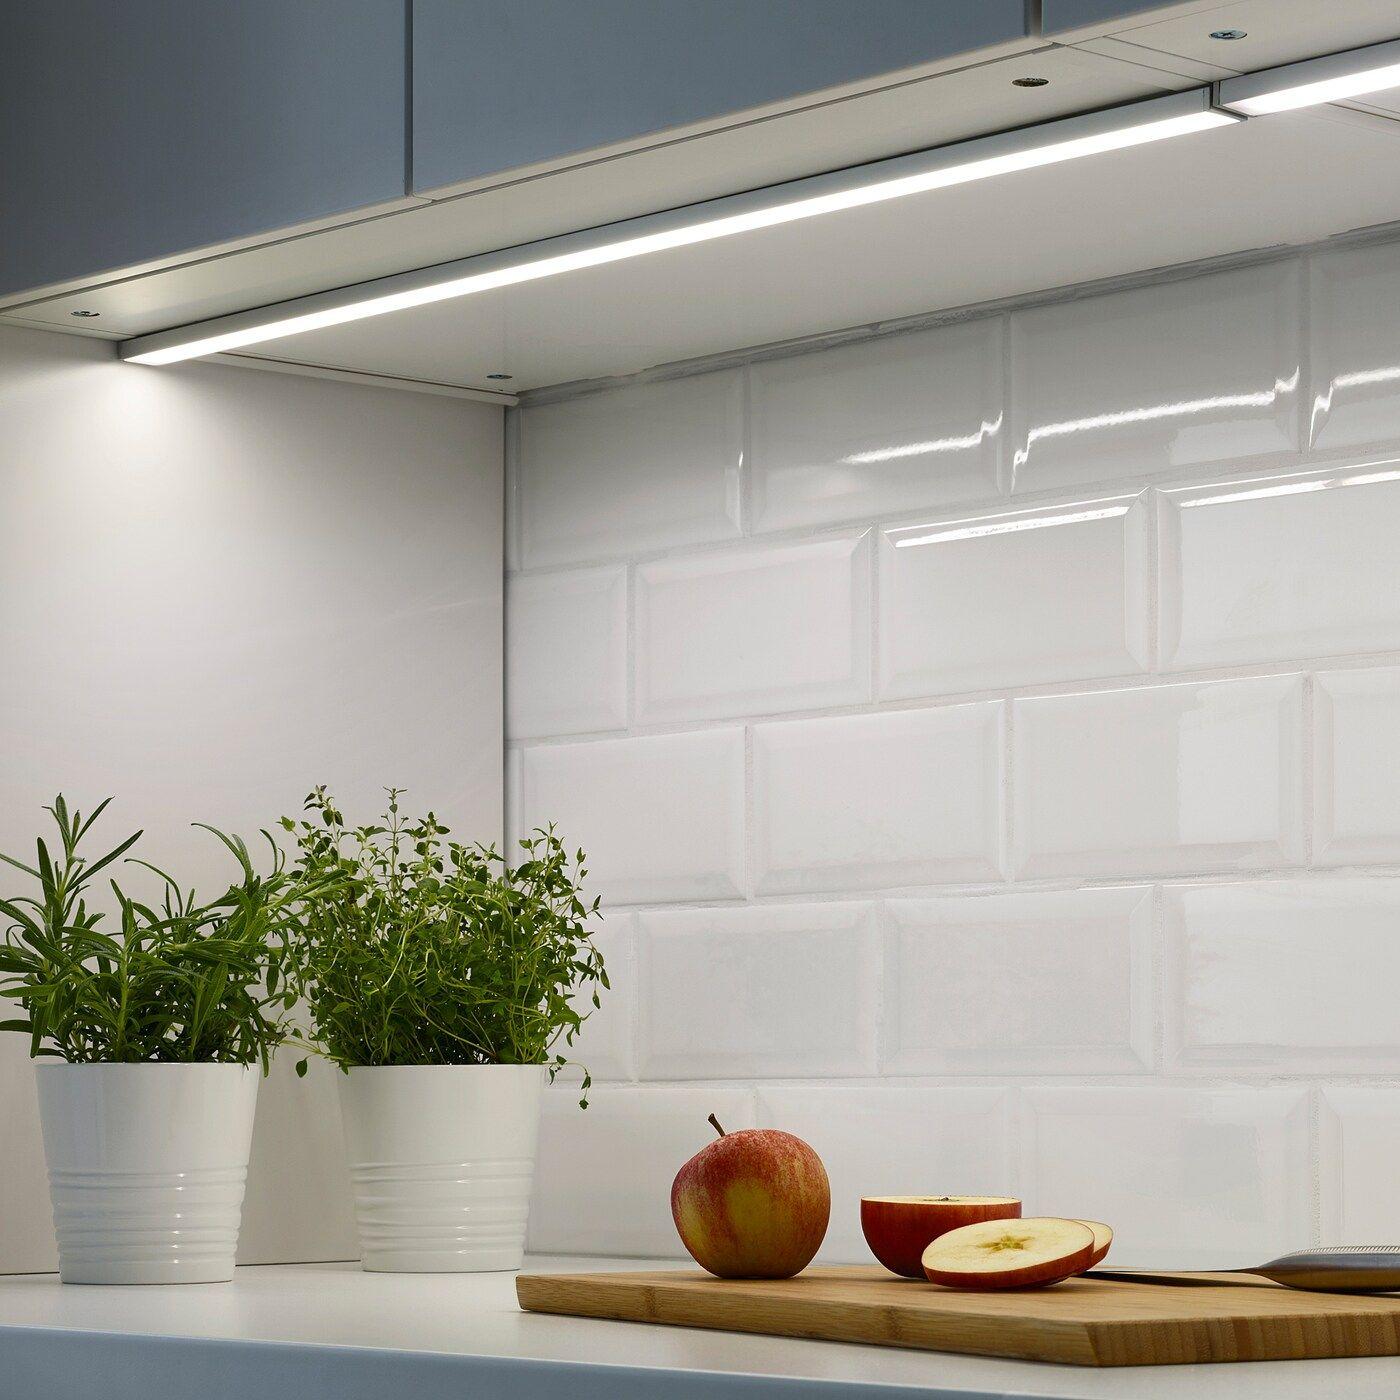 Omlopp Arbeitsbeleuchtung Led Aluminiumfarben Ikea Osterreich In 2020